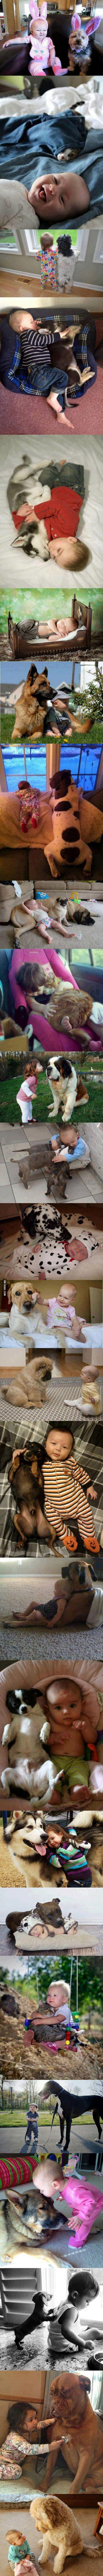 Why kids need pets.